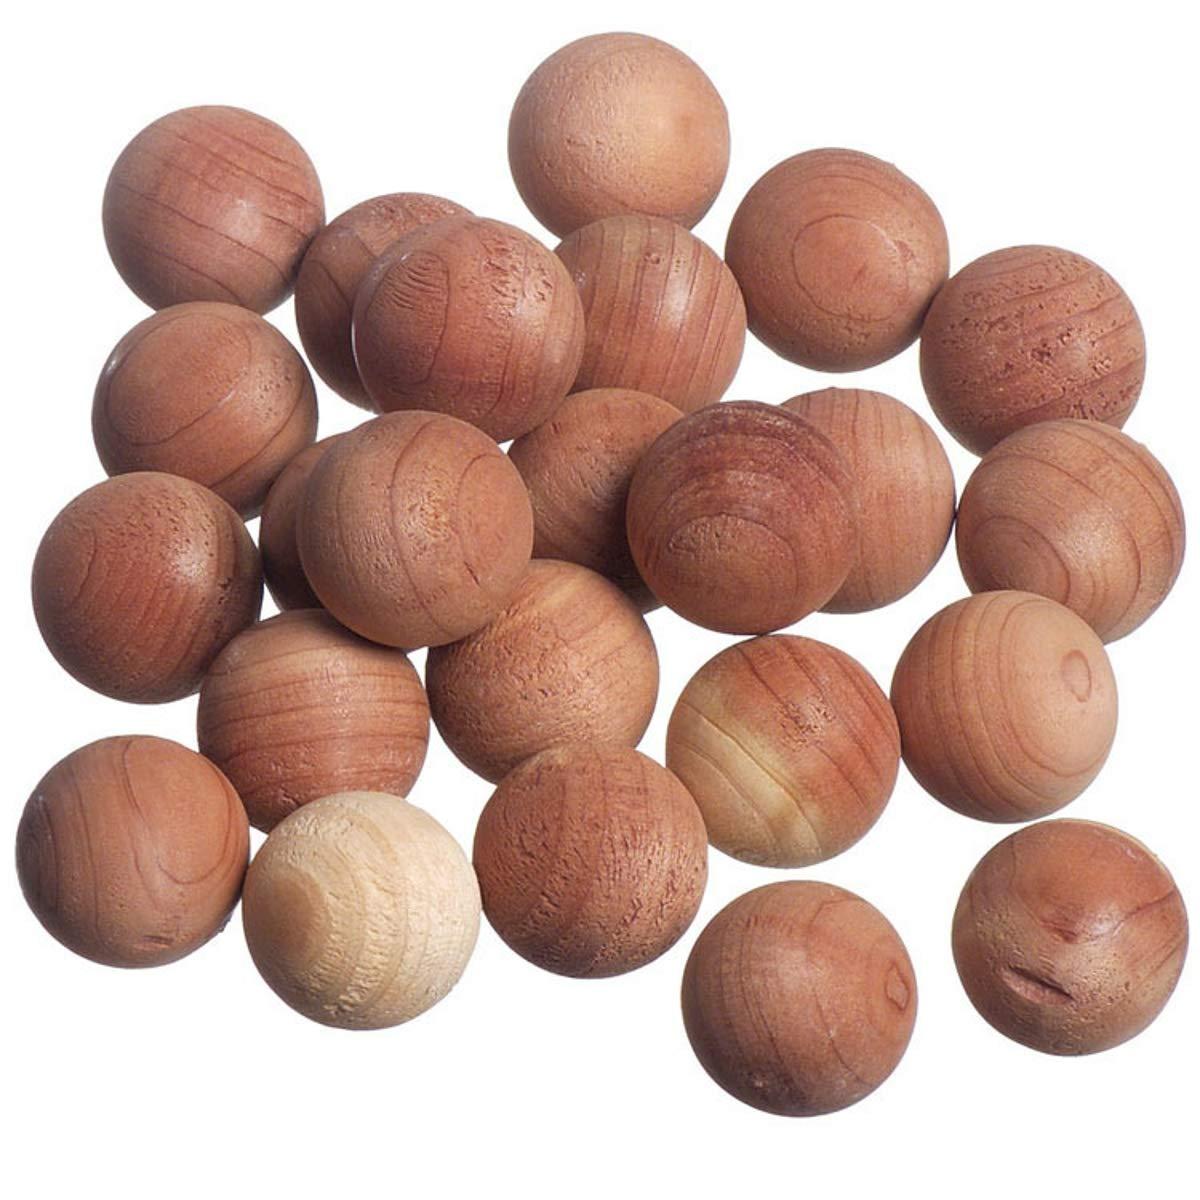 Venxic Natural Cedar Balls Moth Repellent for Closets Drawers Clothes Protector & Gym Shoe Odor Fresh Deodorizer, 50 Pack